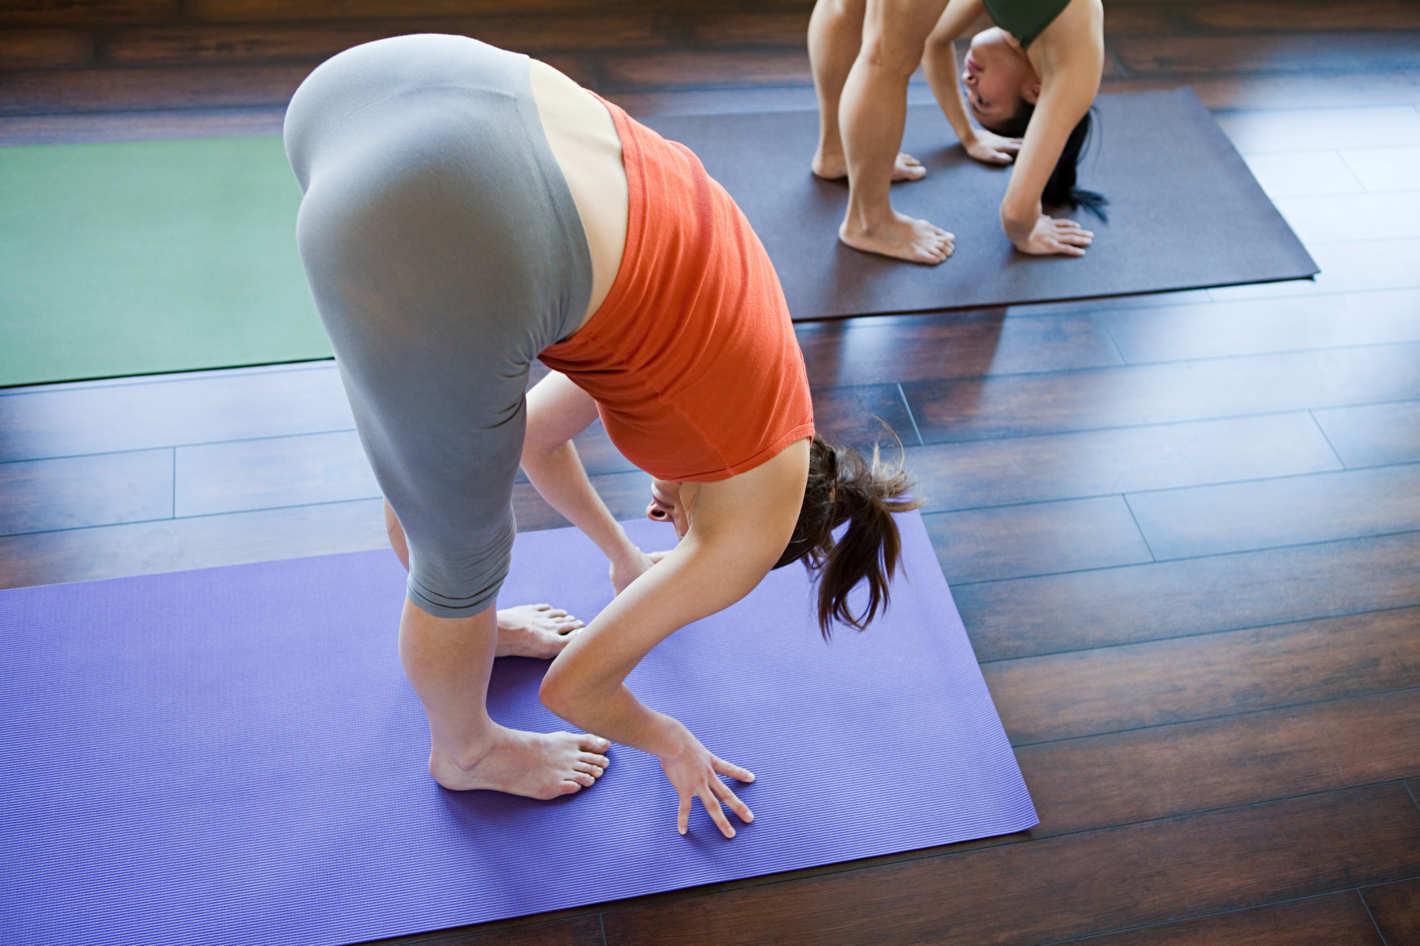 naturist-yoga-booty-amateur-positions-drama-girl